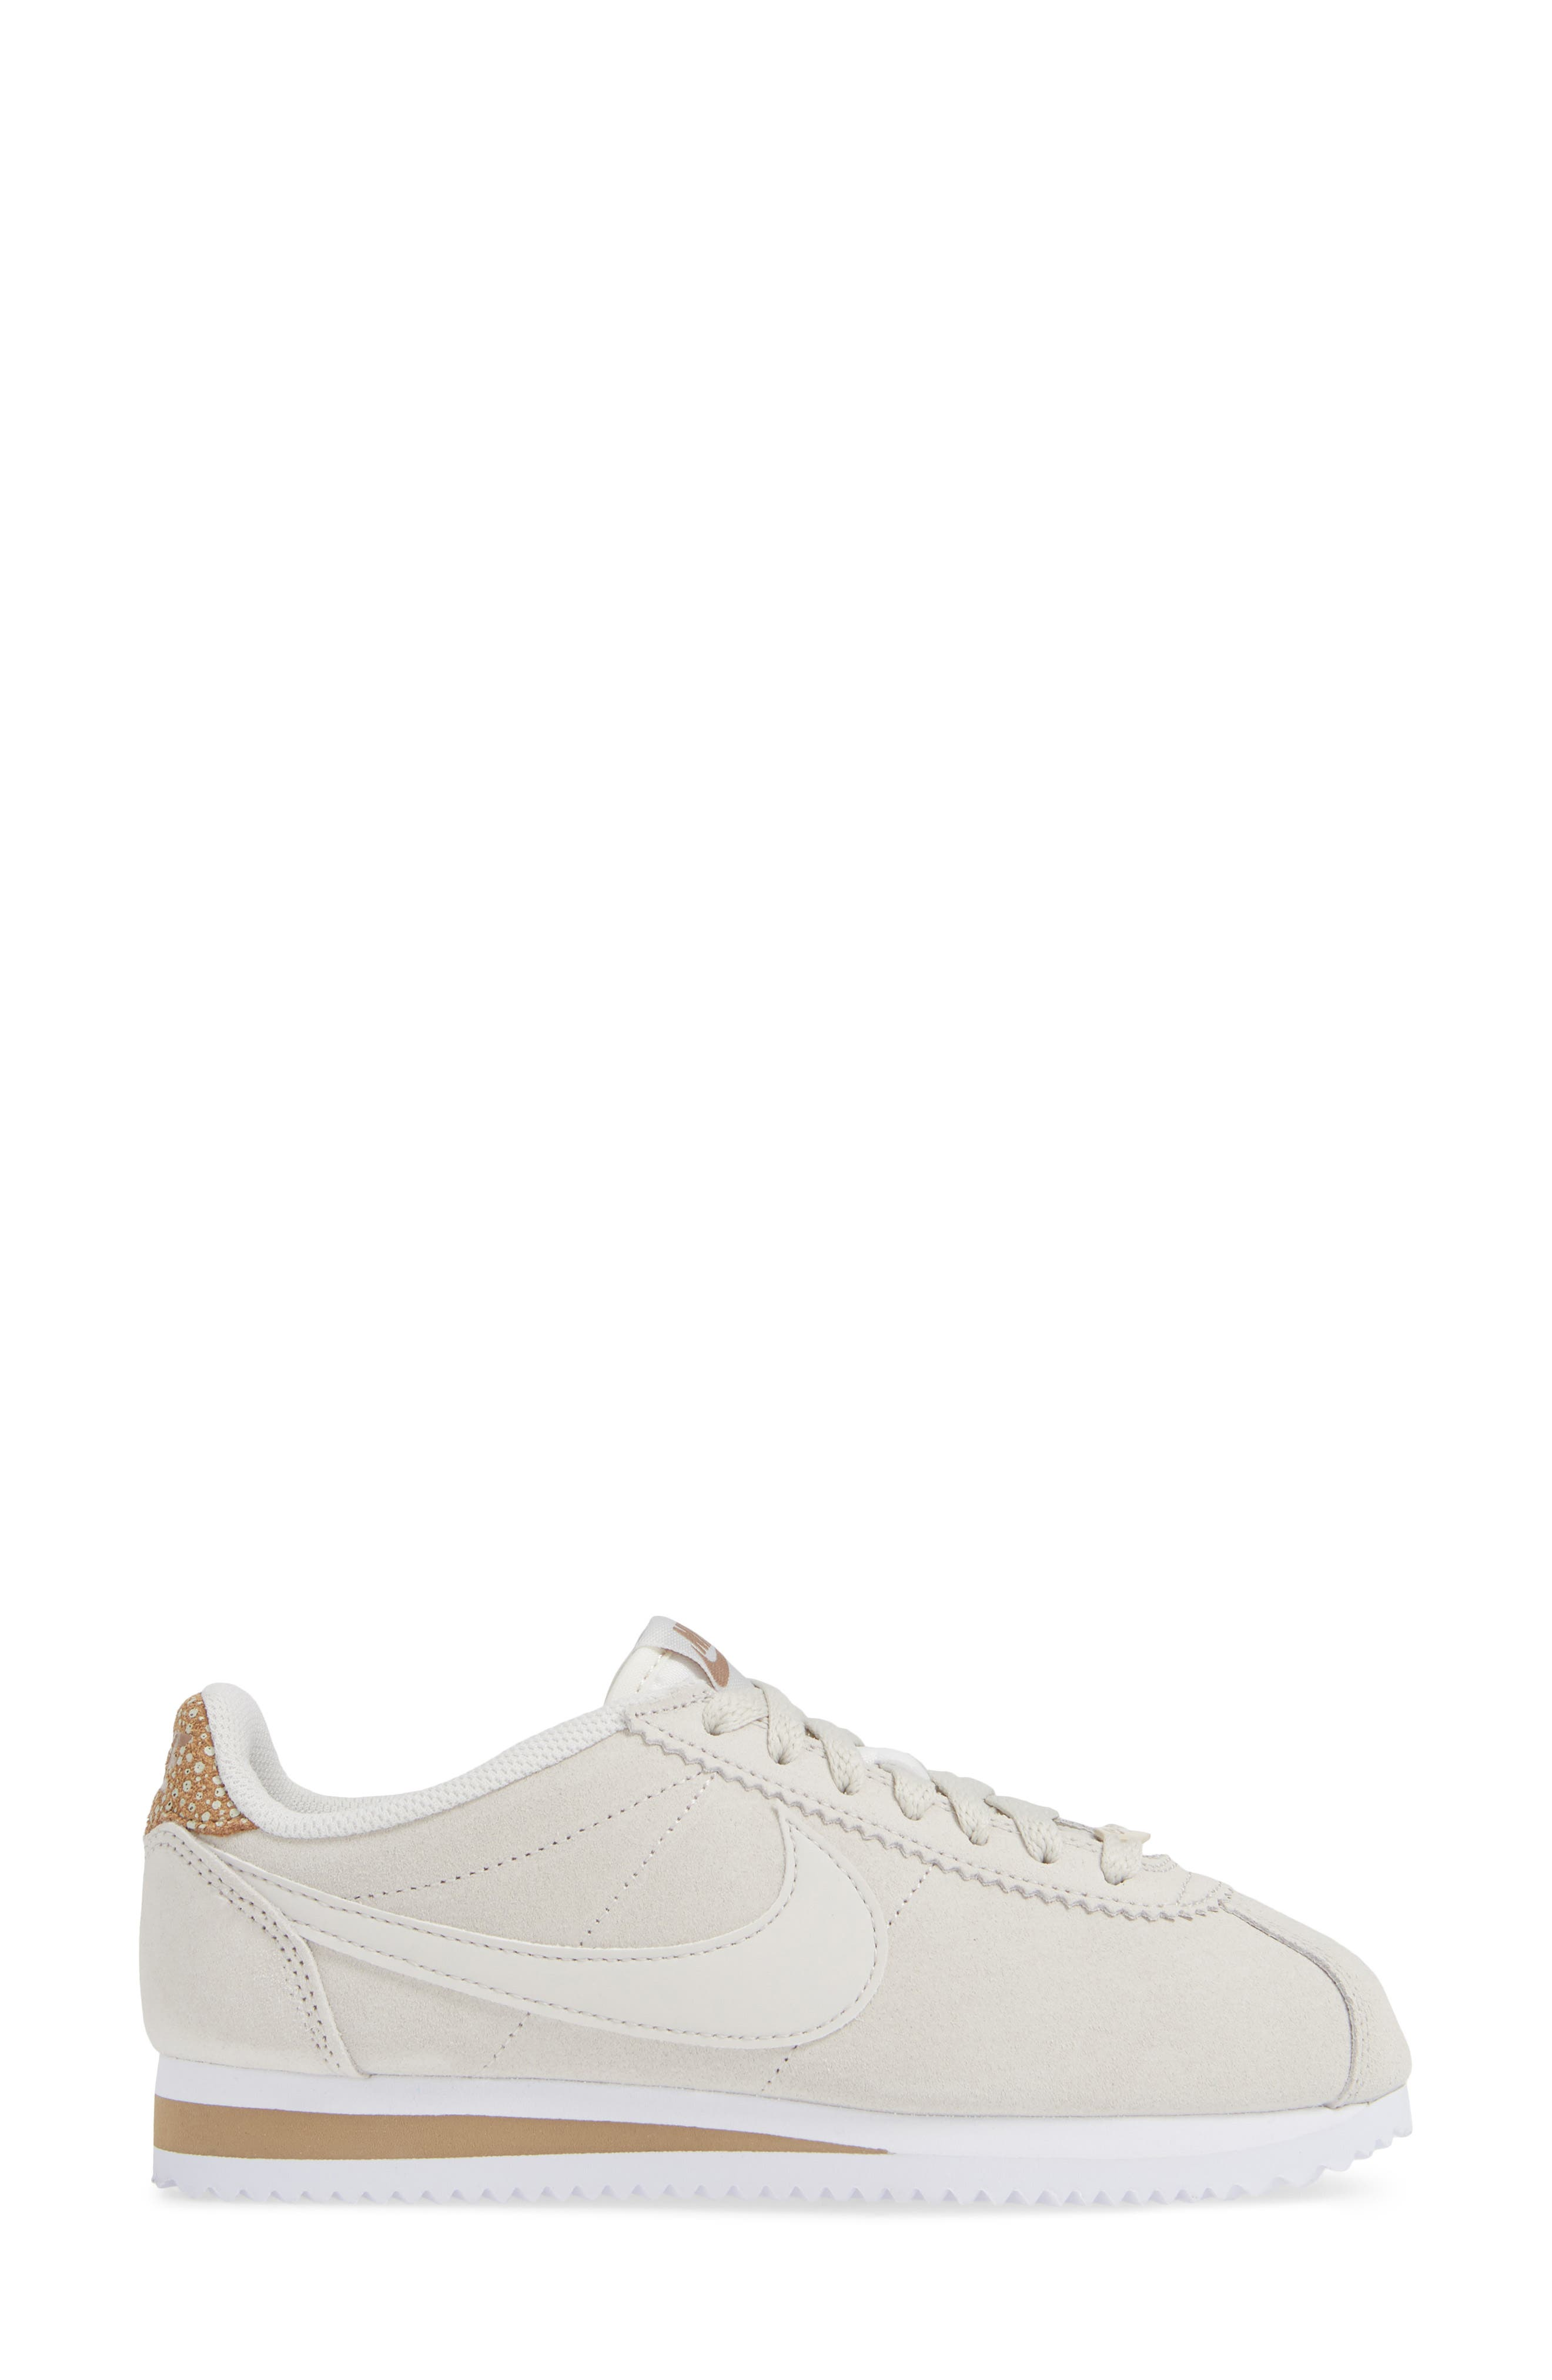 Classic Cortez Premium Sneaker,                             Alternate thumbnail 3, color,                             LIGHT BONE/ CANTEEN